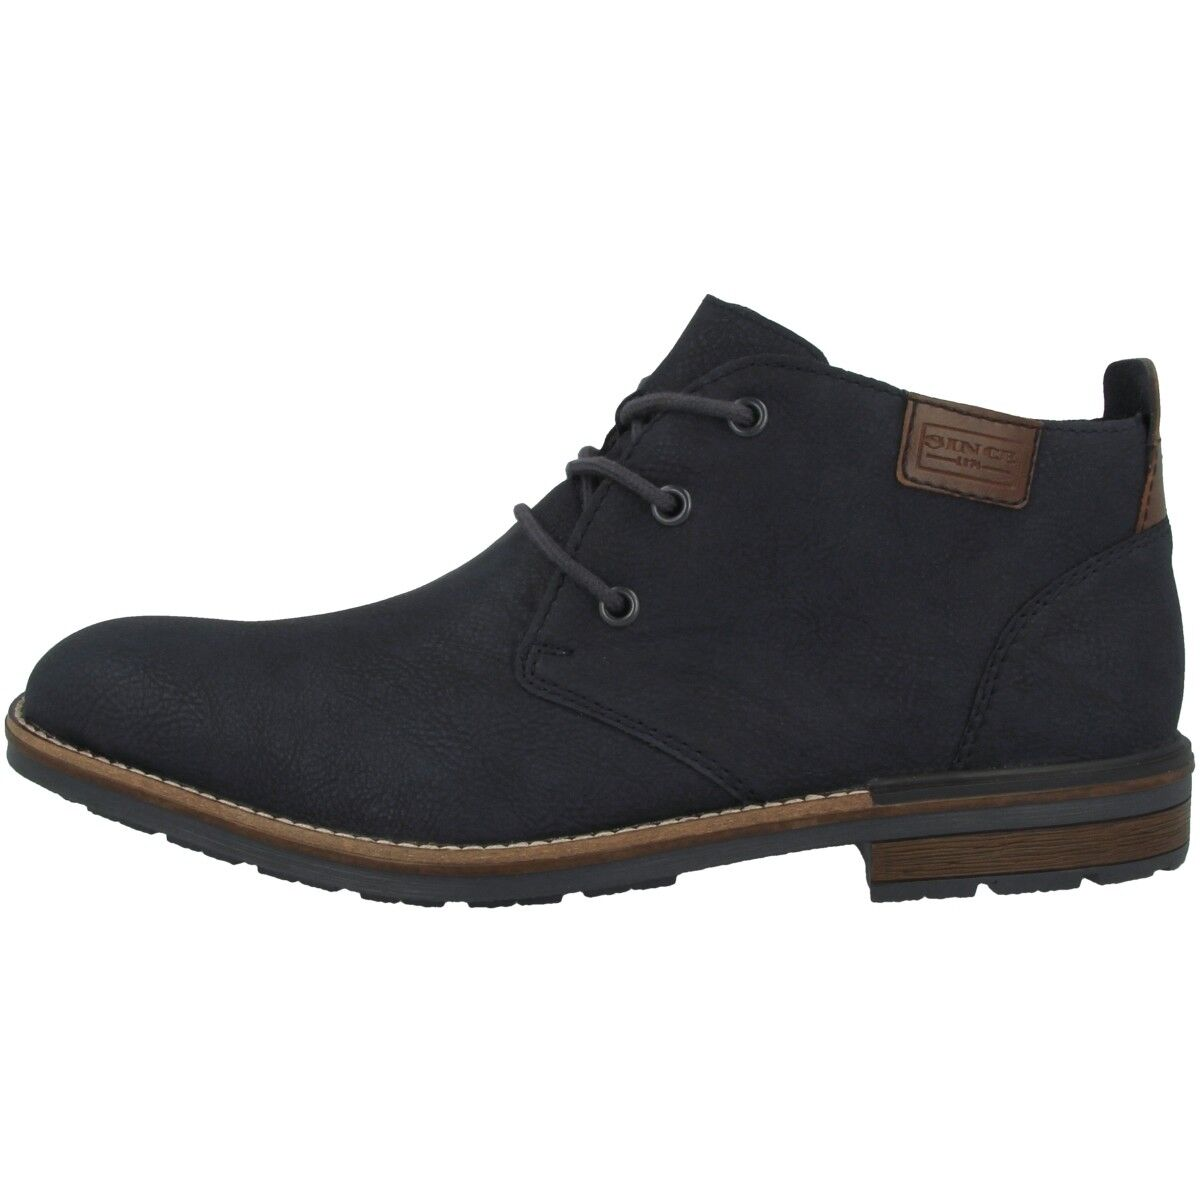 Rieker Derby-Ambor Schuhe Herren Antistress Schnürer Halbschuhe blue B1340-14